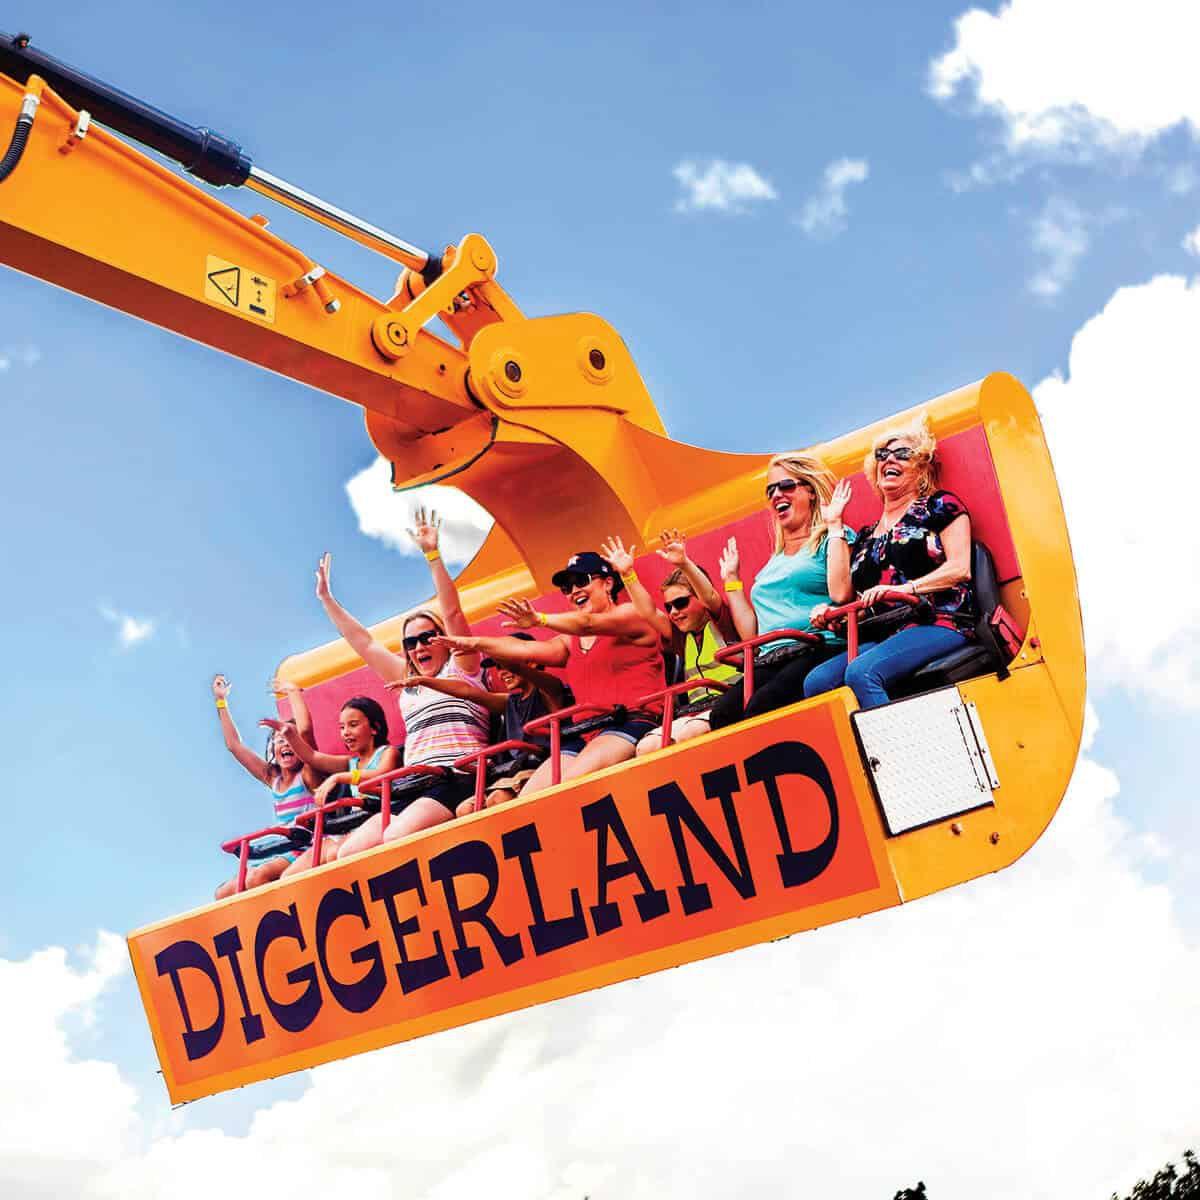 Diggerland USA NJ theme park